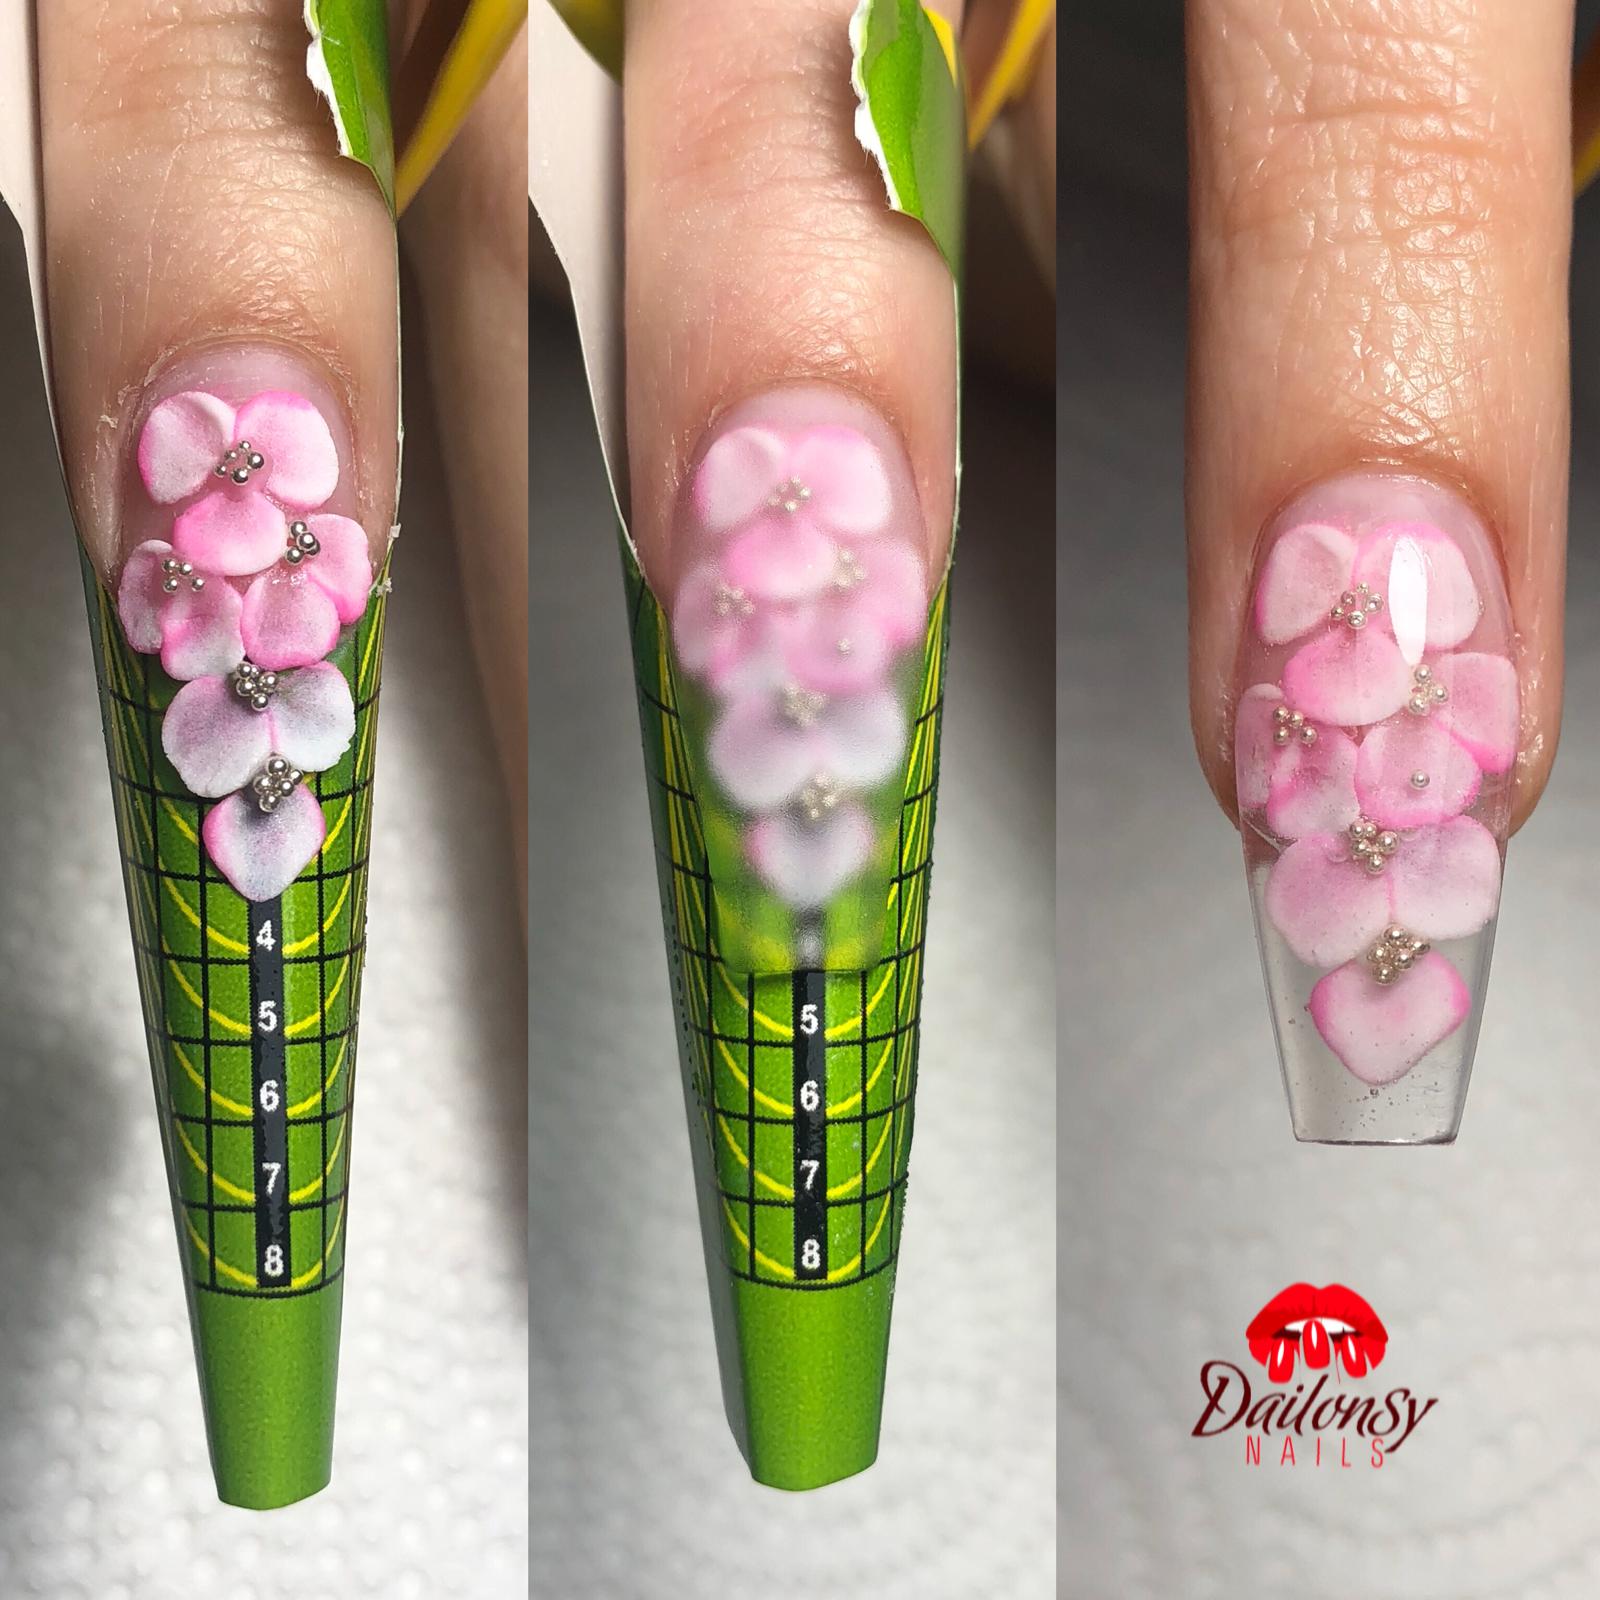 Pin De Dailonsy Nails En Nails Técnicas De Uñas Manicura